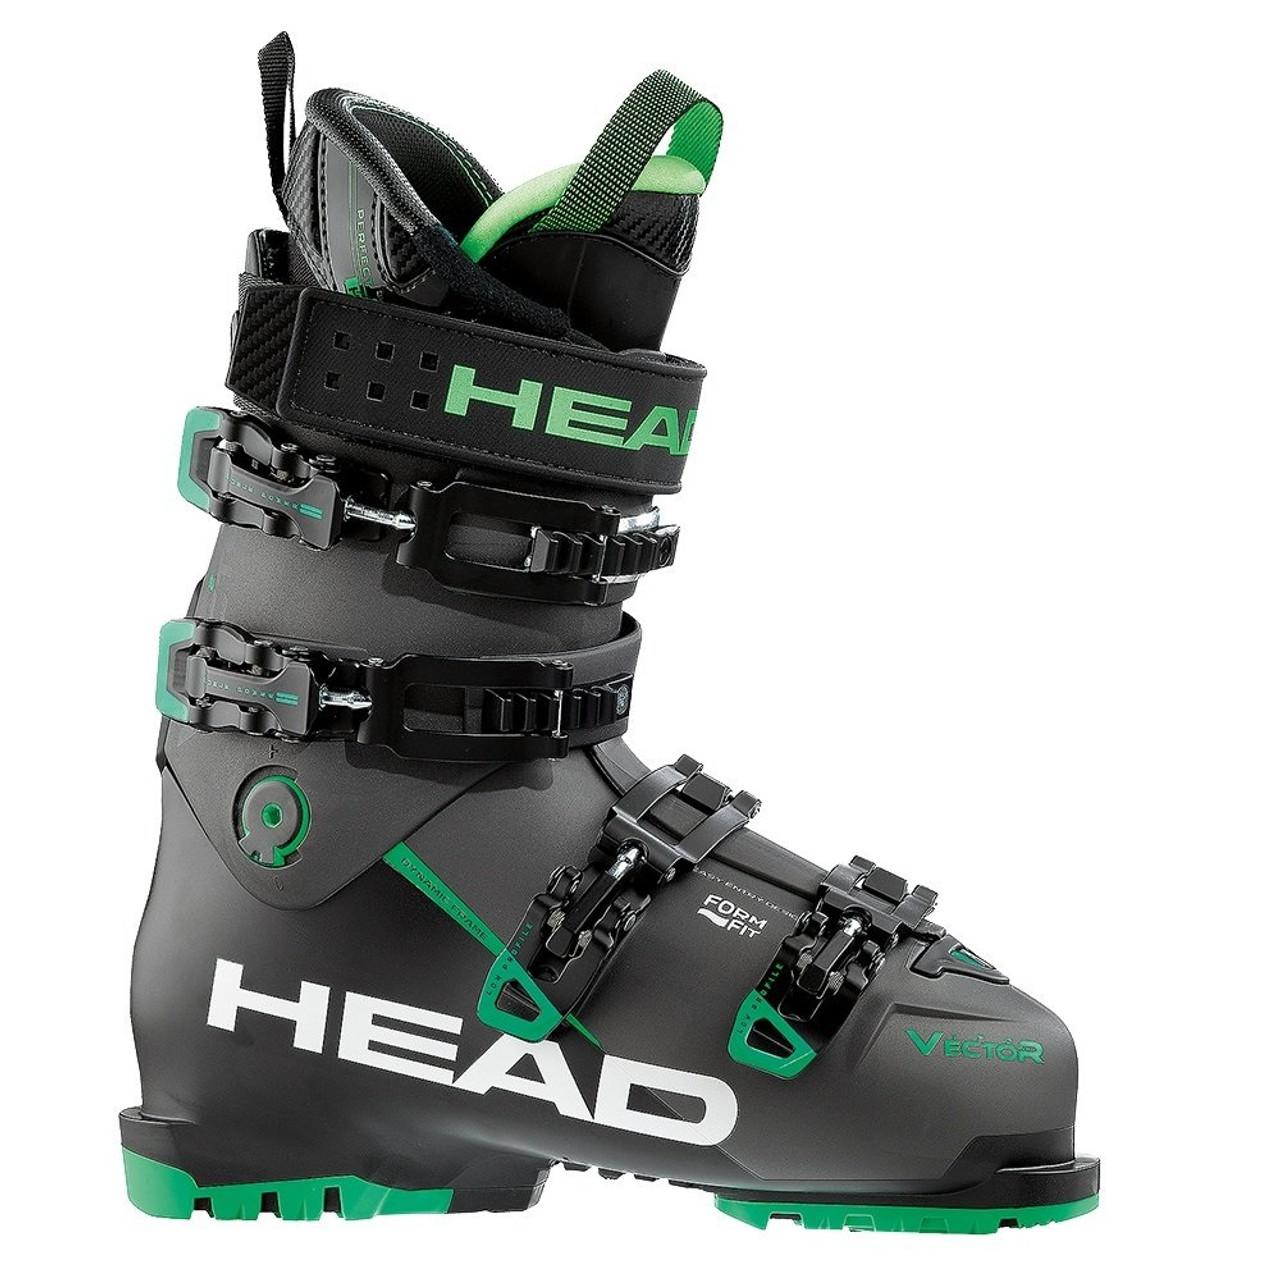 03843609a6 Head Vector Evo 120 Anthracite Mens Ski Boots